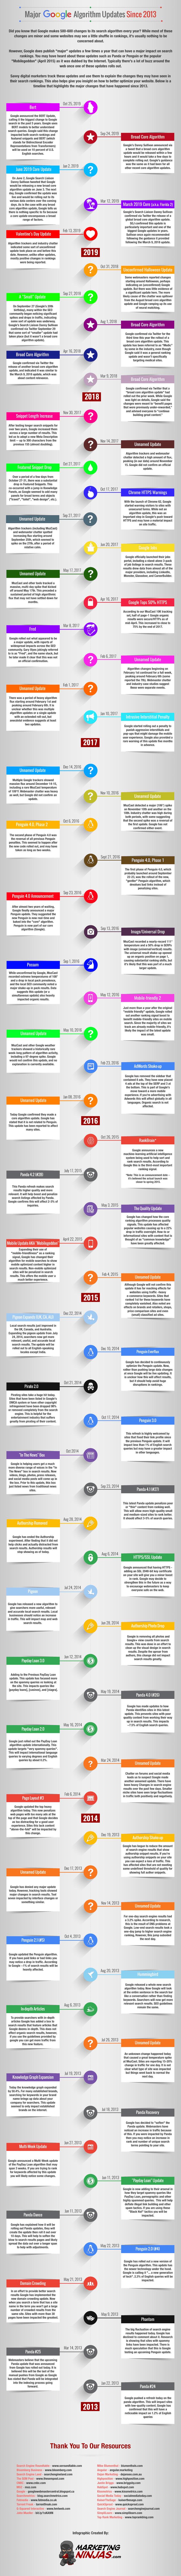 Major Google Algorithm Updates Since 2013 [Infographic] Image